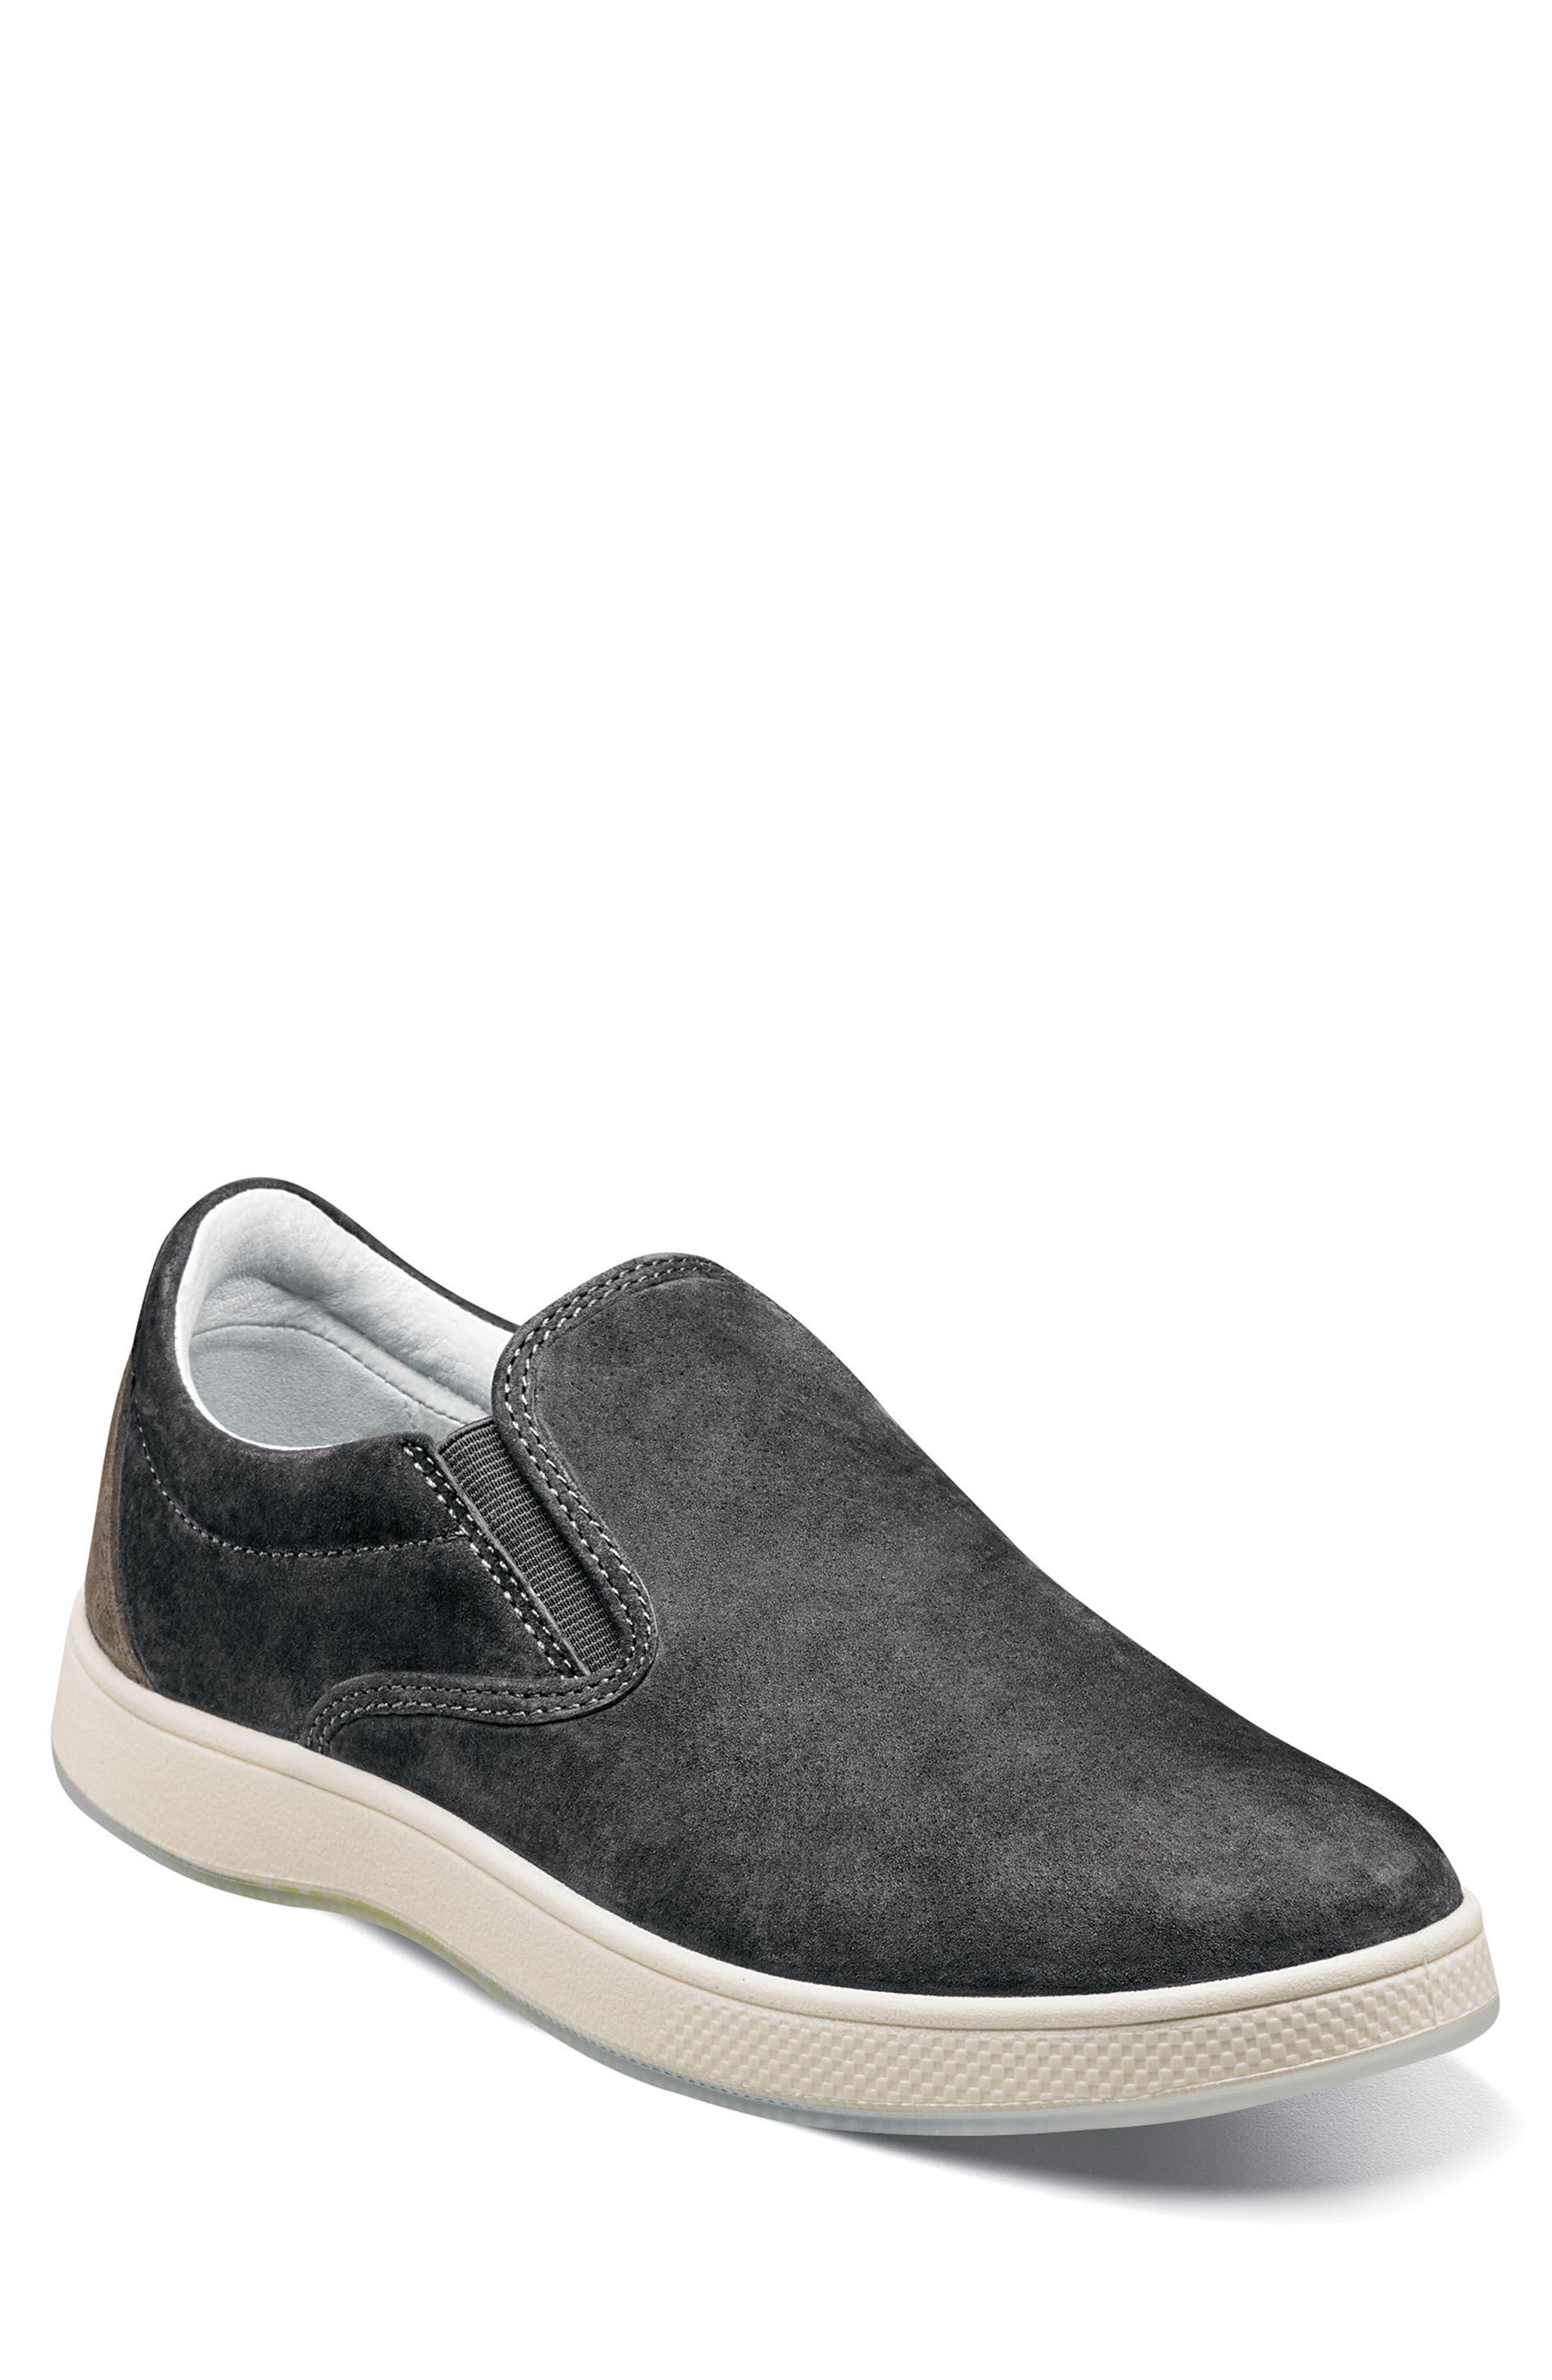 Edge Slip-On Sneaker,                             Main thumbnail 1, color,                             Charcoal Nubuck